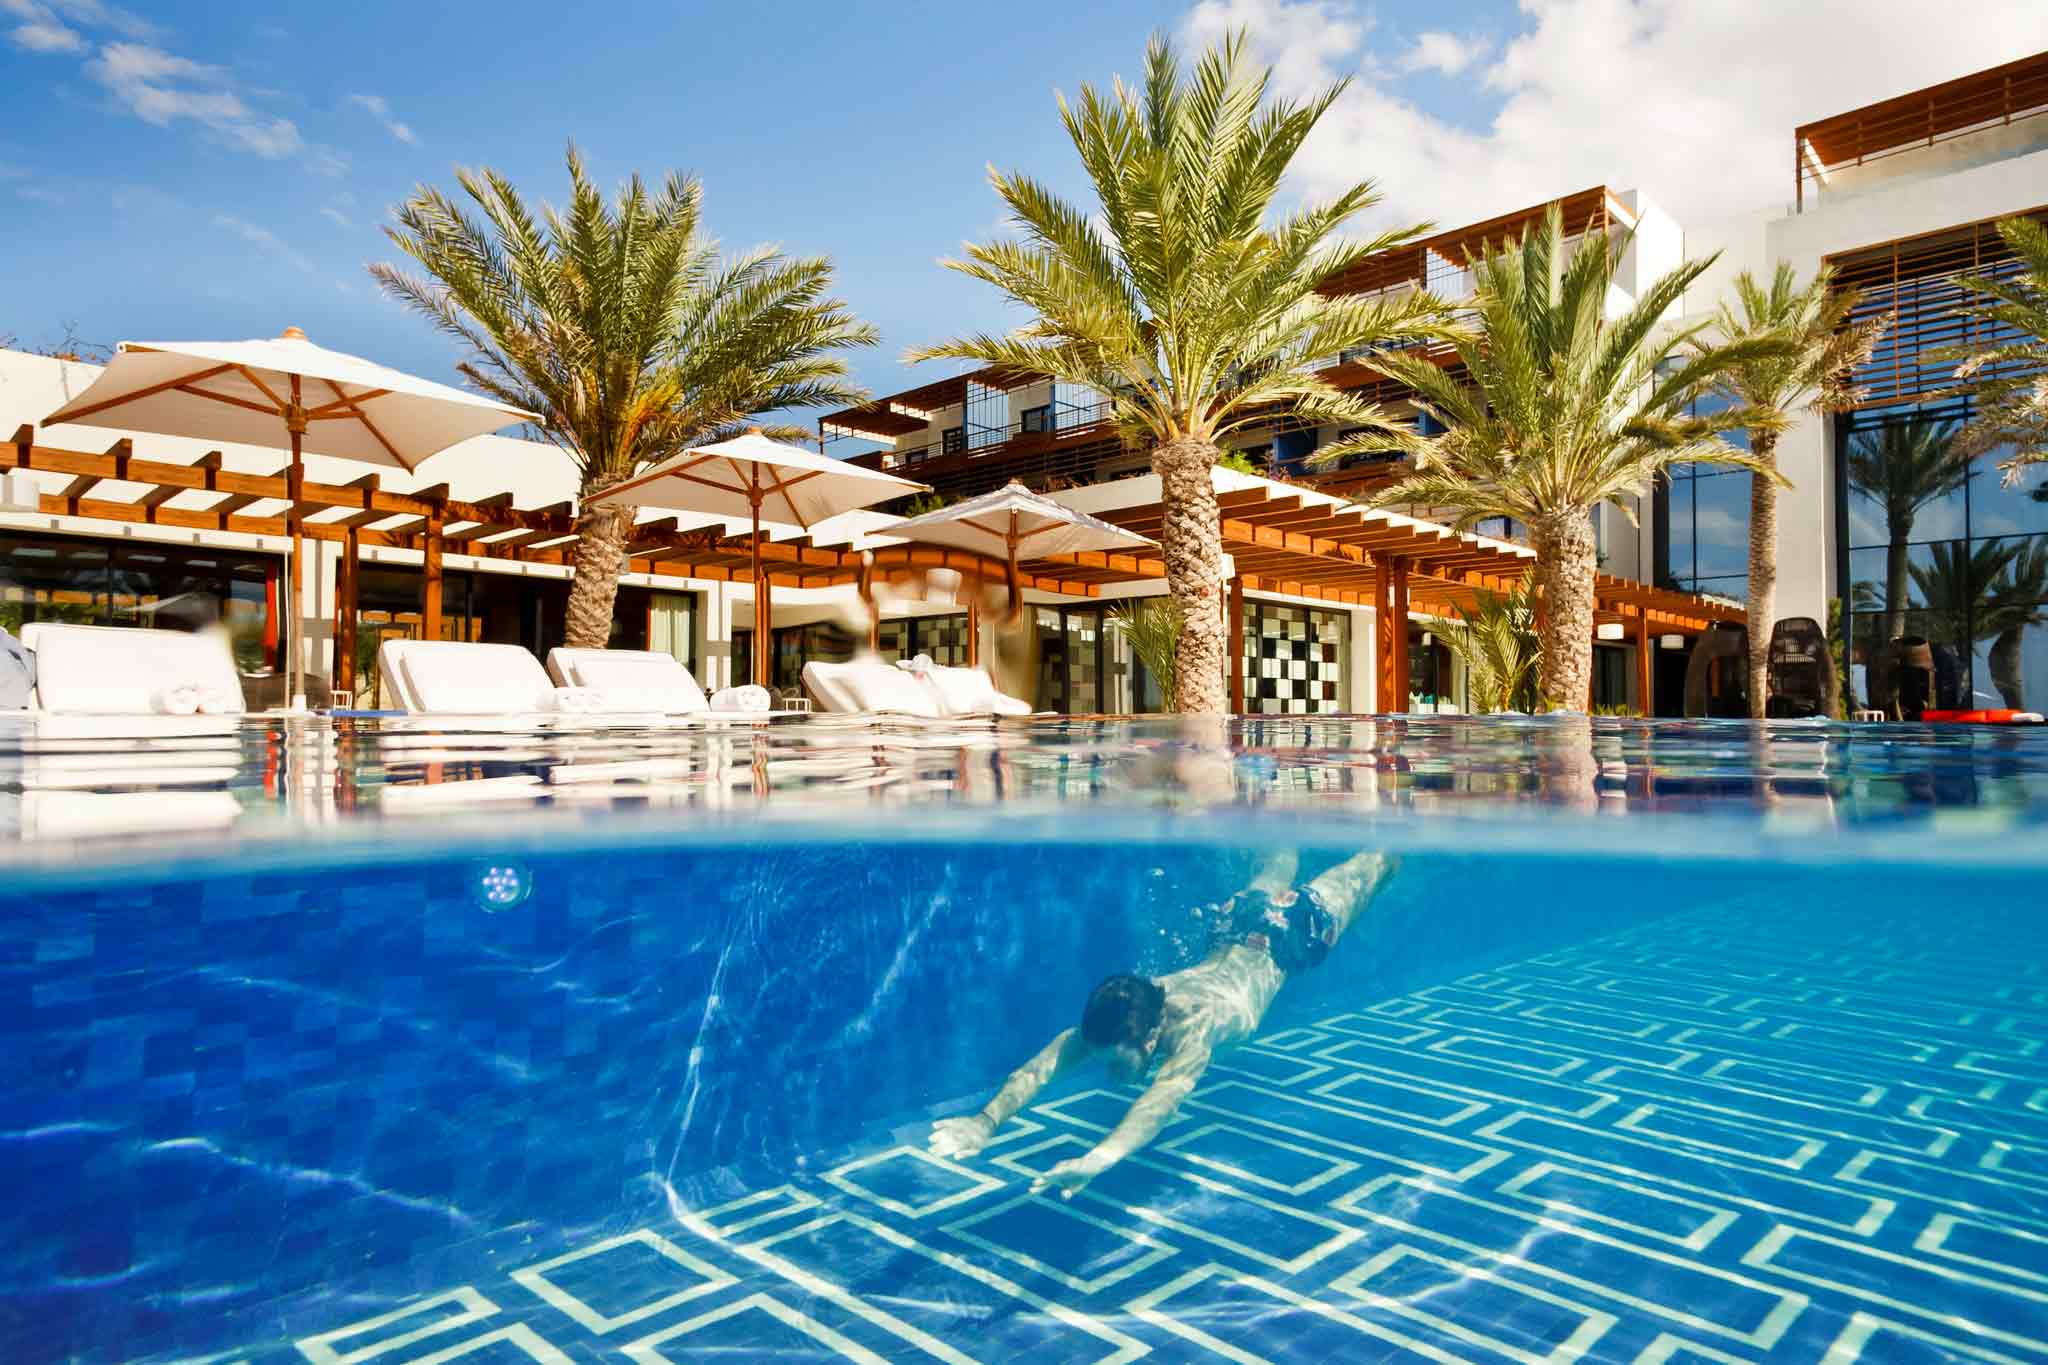 sofitel-essaouira-swimming-pool